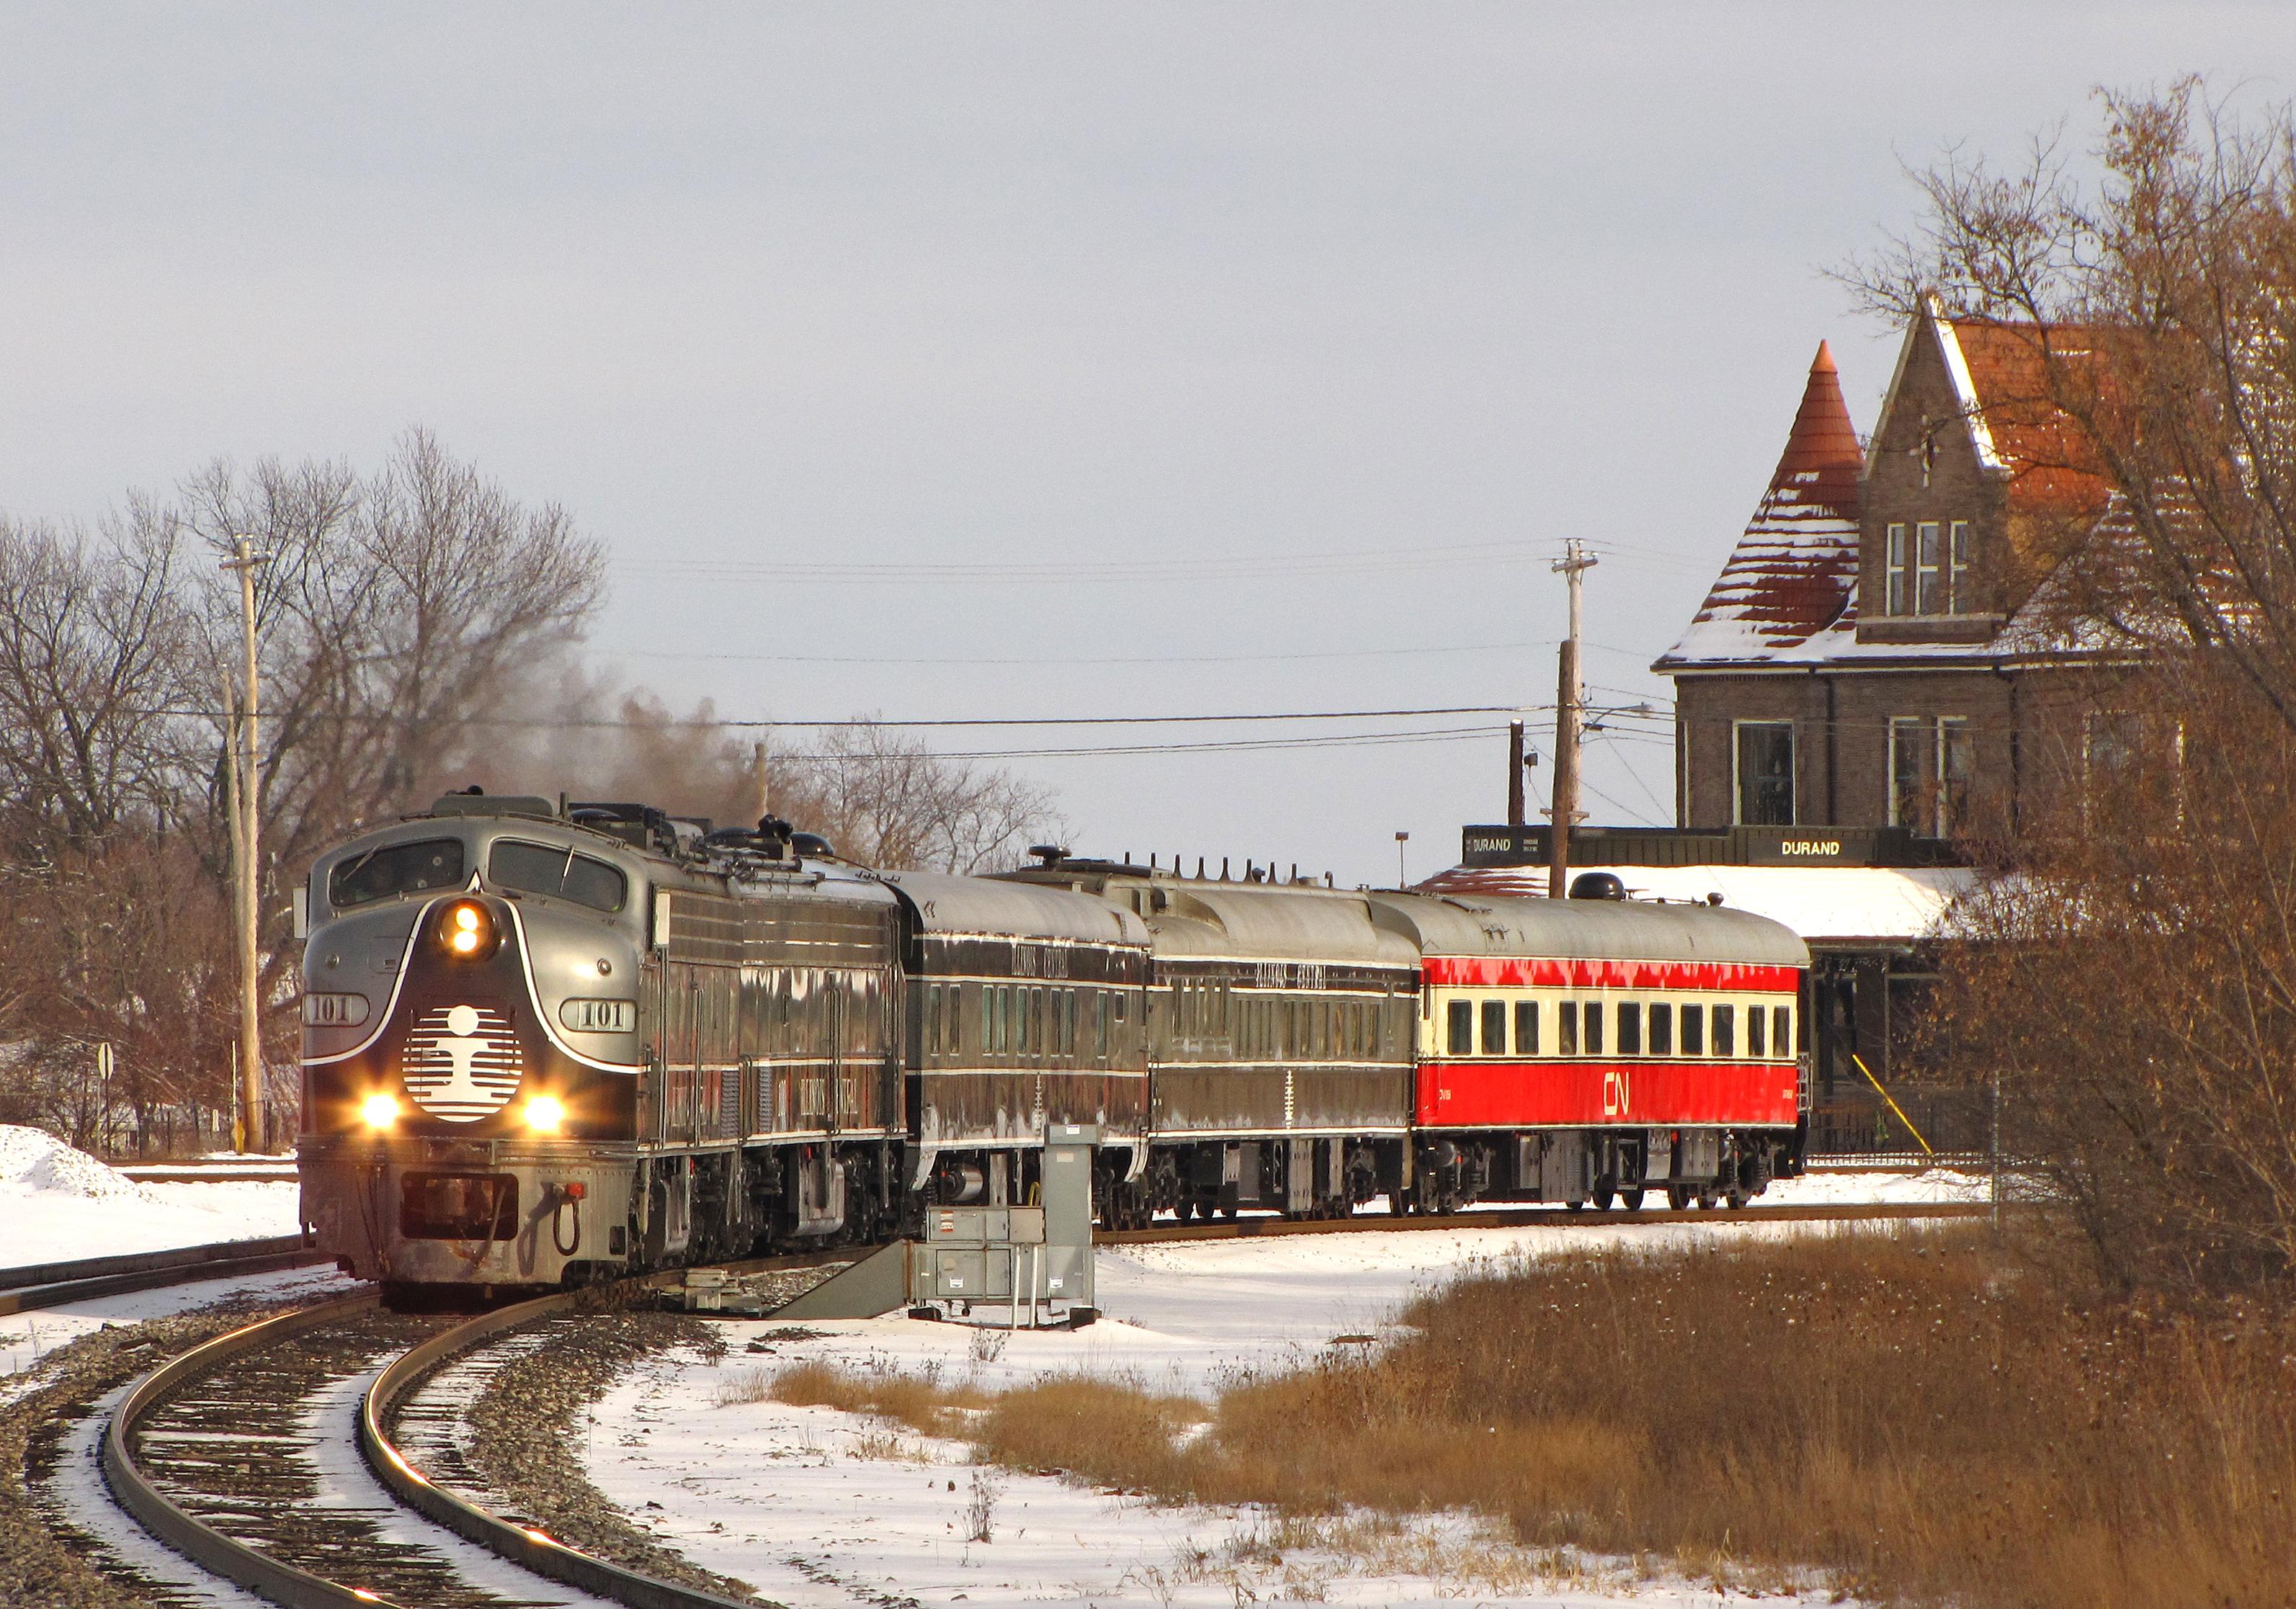 wallpaper snow winter vehicle train railway canadian christmas illinois michigan santa western locomotive passenger 100 national weather